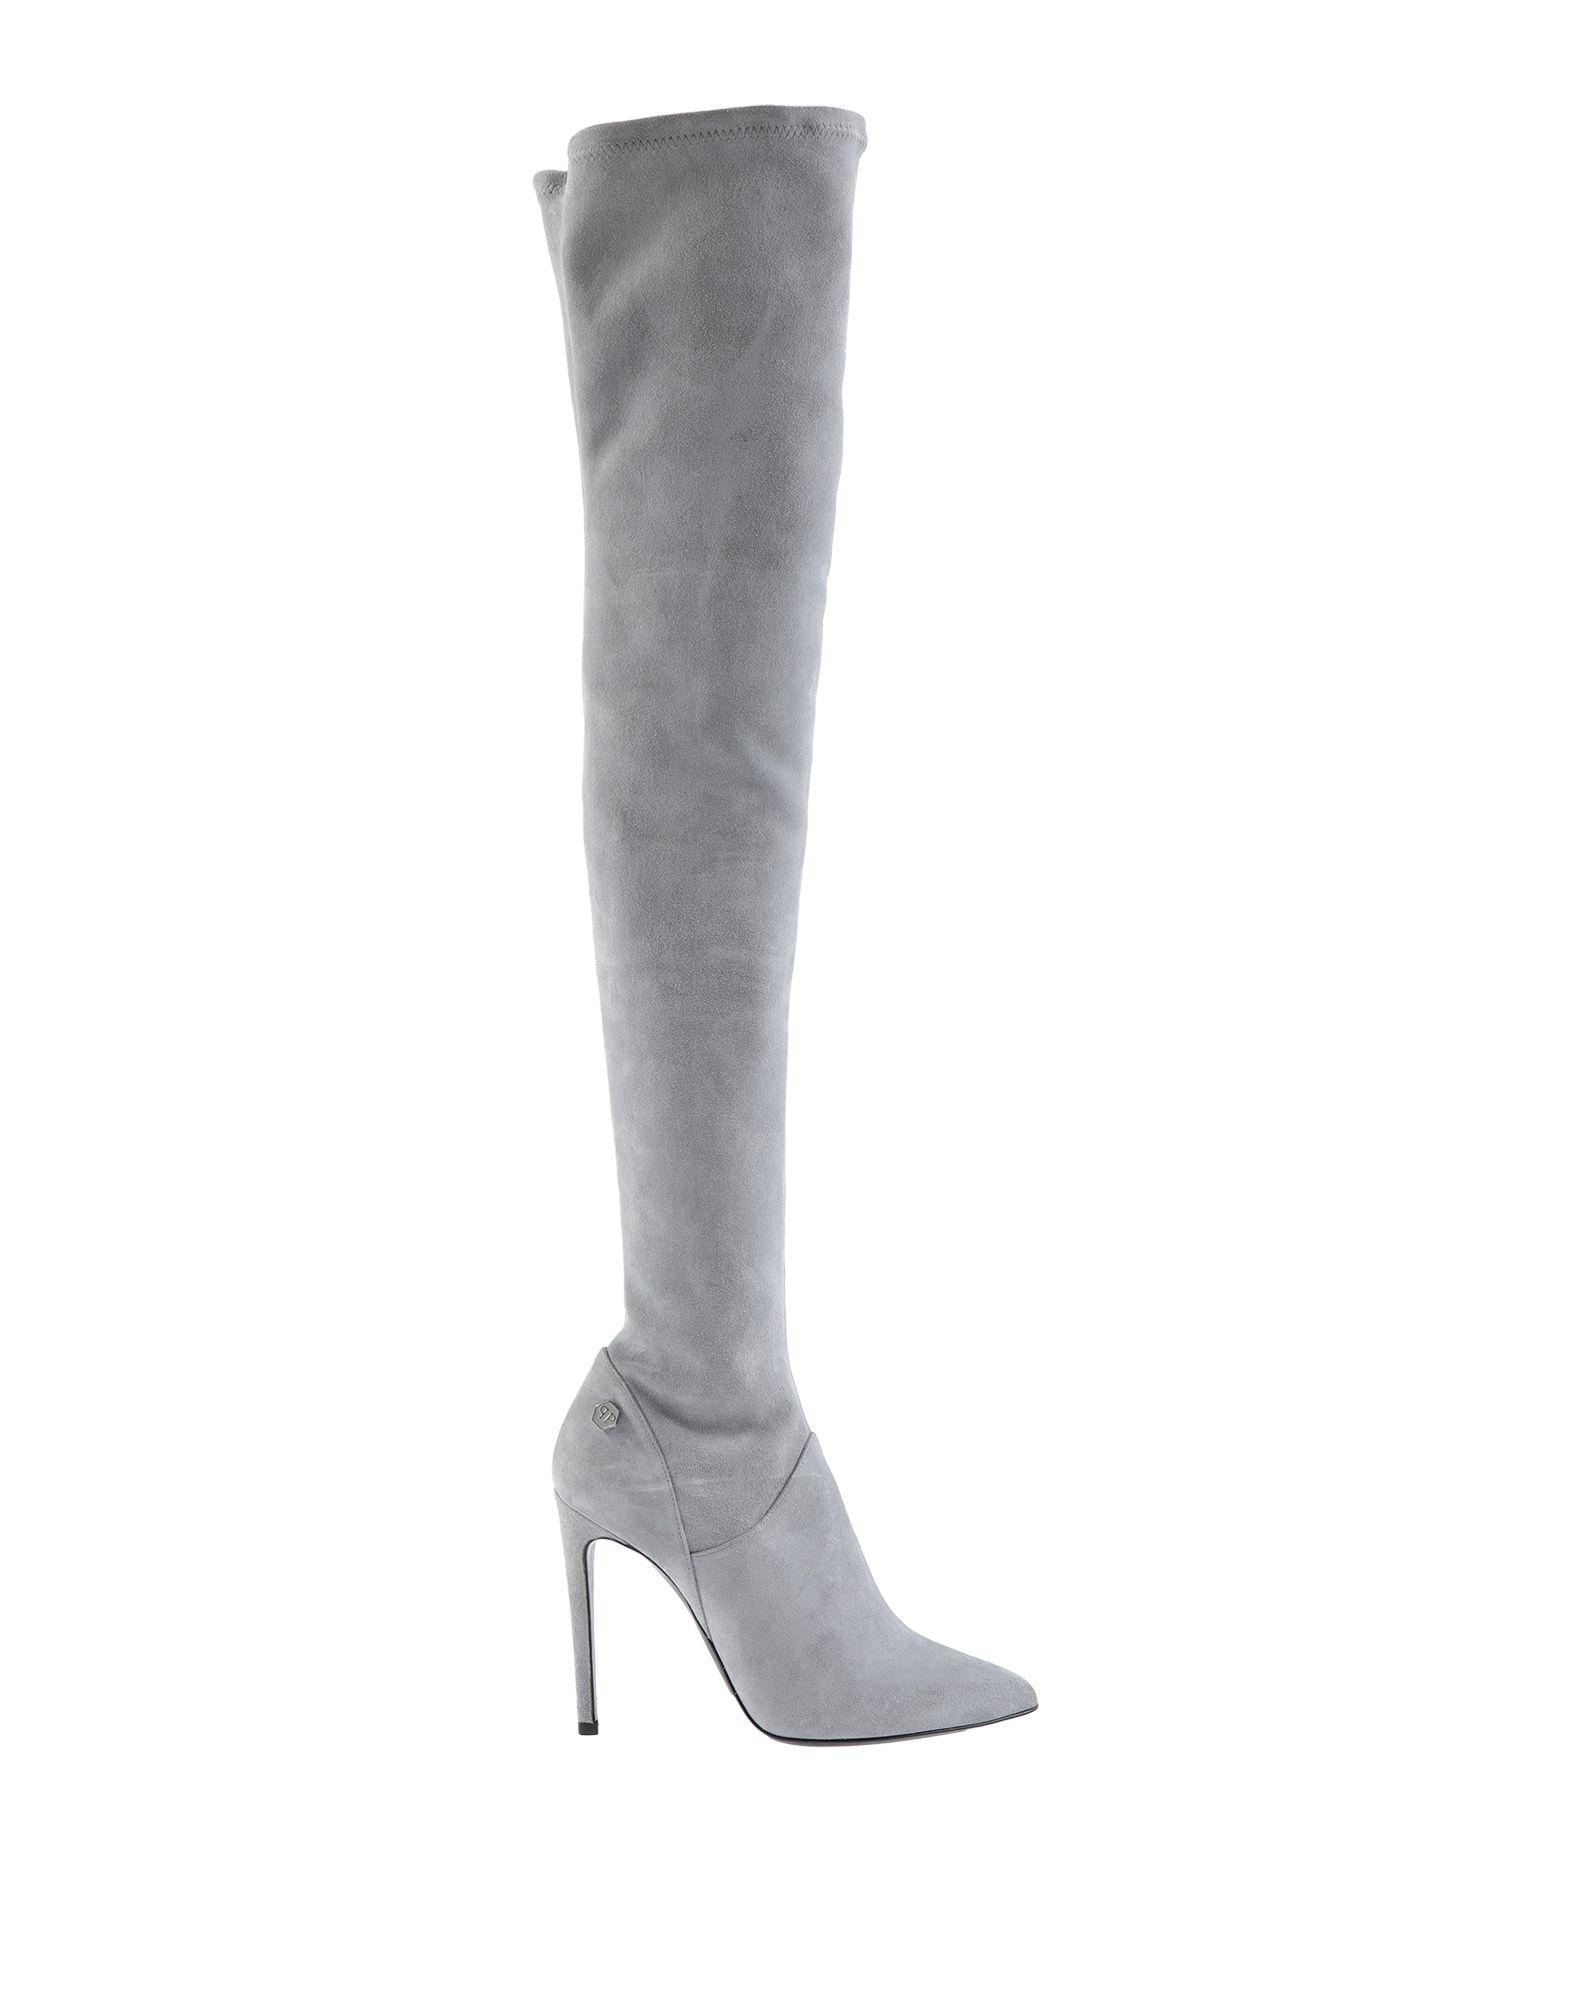 Philipp Plein Plein Boots - Women Philipp Plein Plein Boots online on  Australia - 11544000HE c9136b